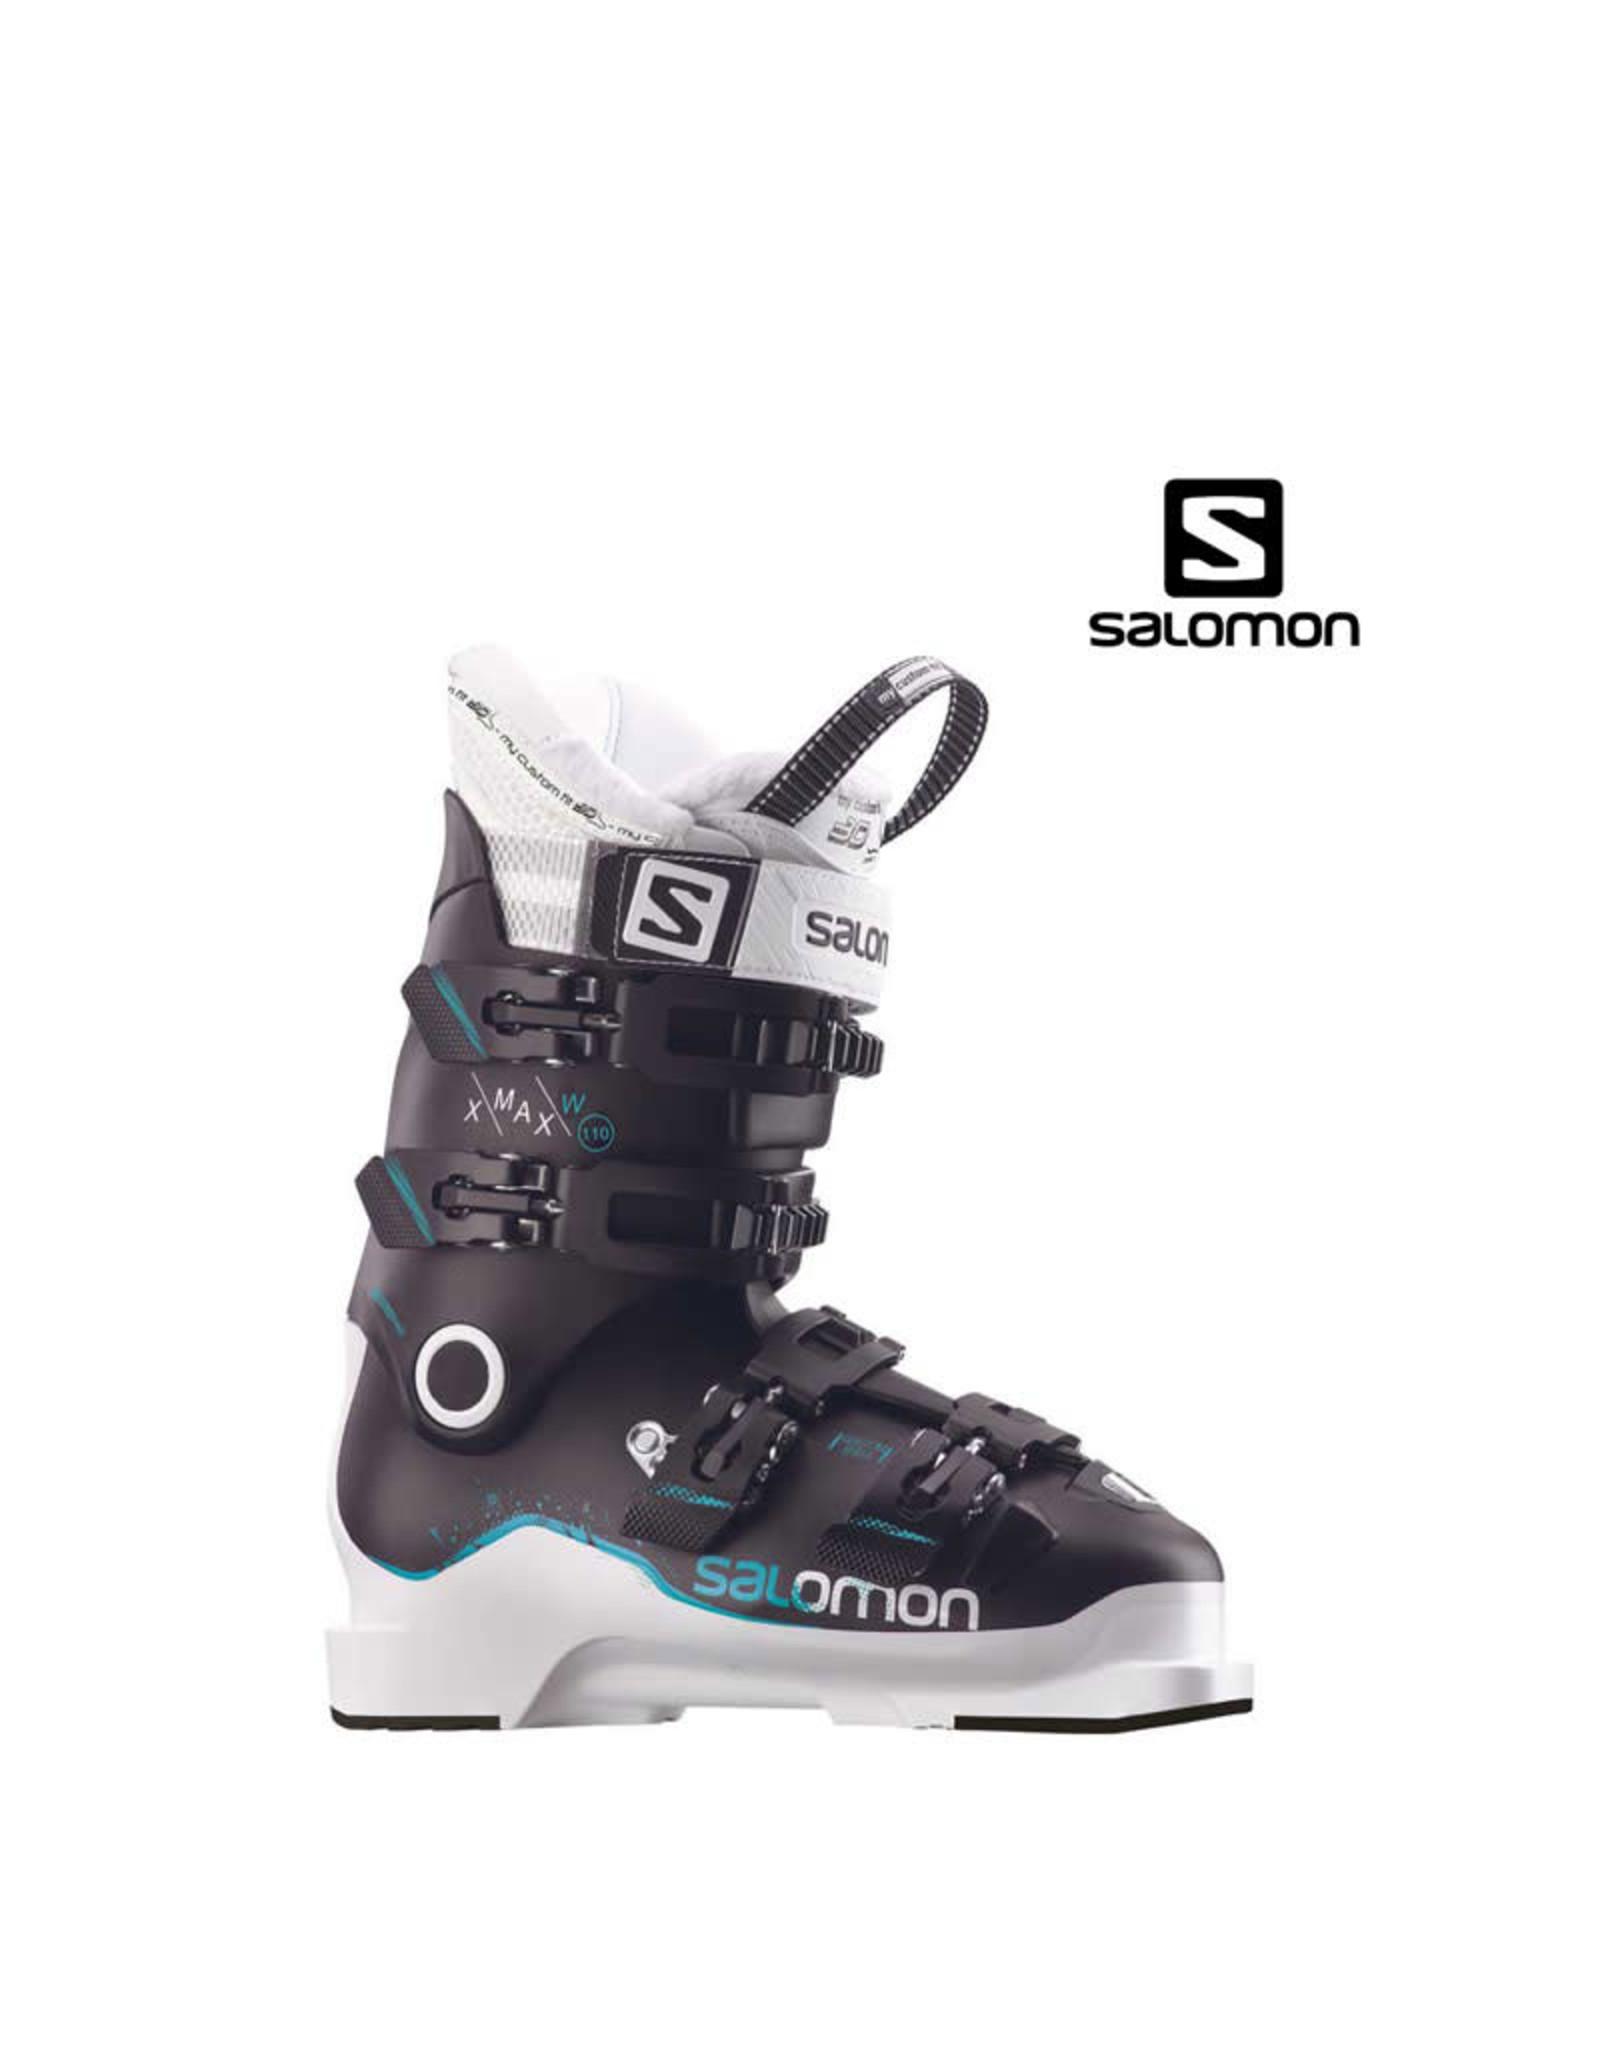 SALOMON Skischoenen SALOMON Xmax W110 Gebruikt 41 (mondo 26)